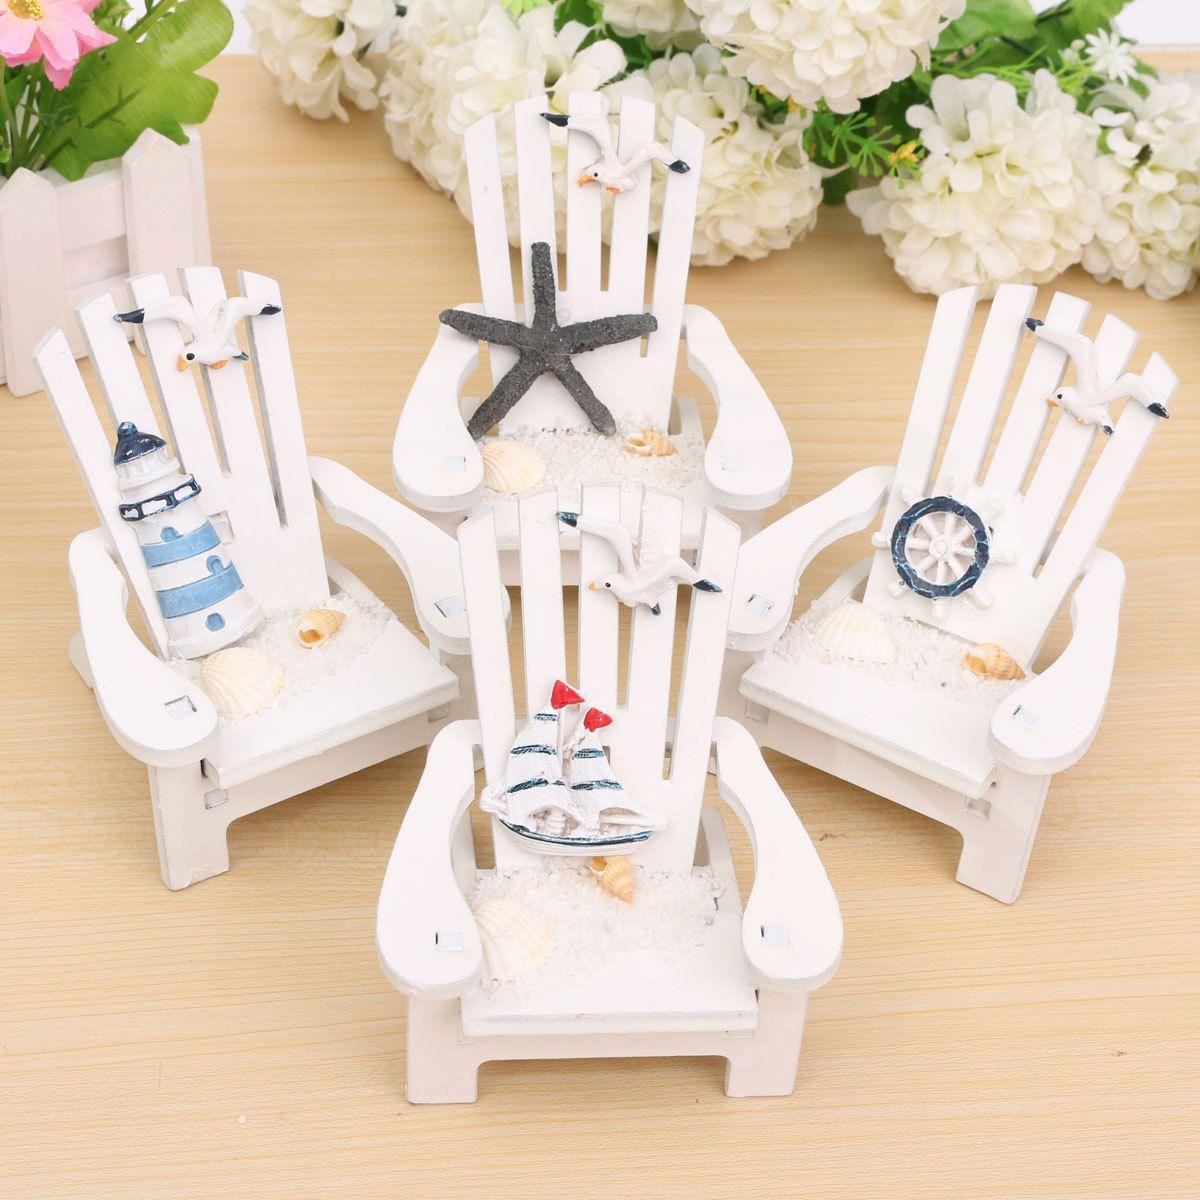 Kids GIFT Mini Fairy Garden Wood Chair Bench Model Doll House Decor Helmsman